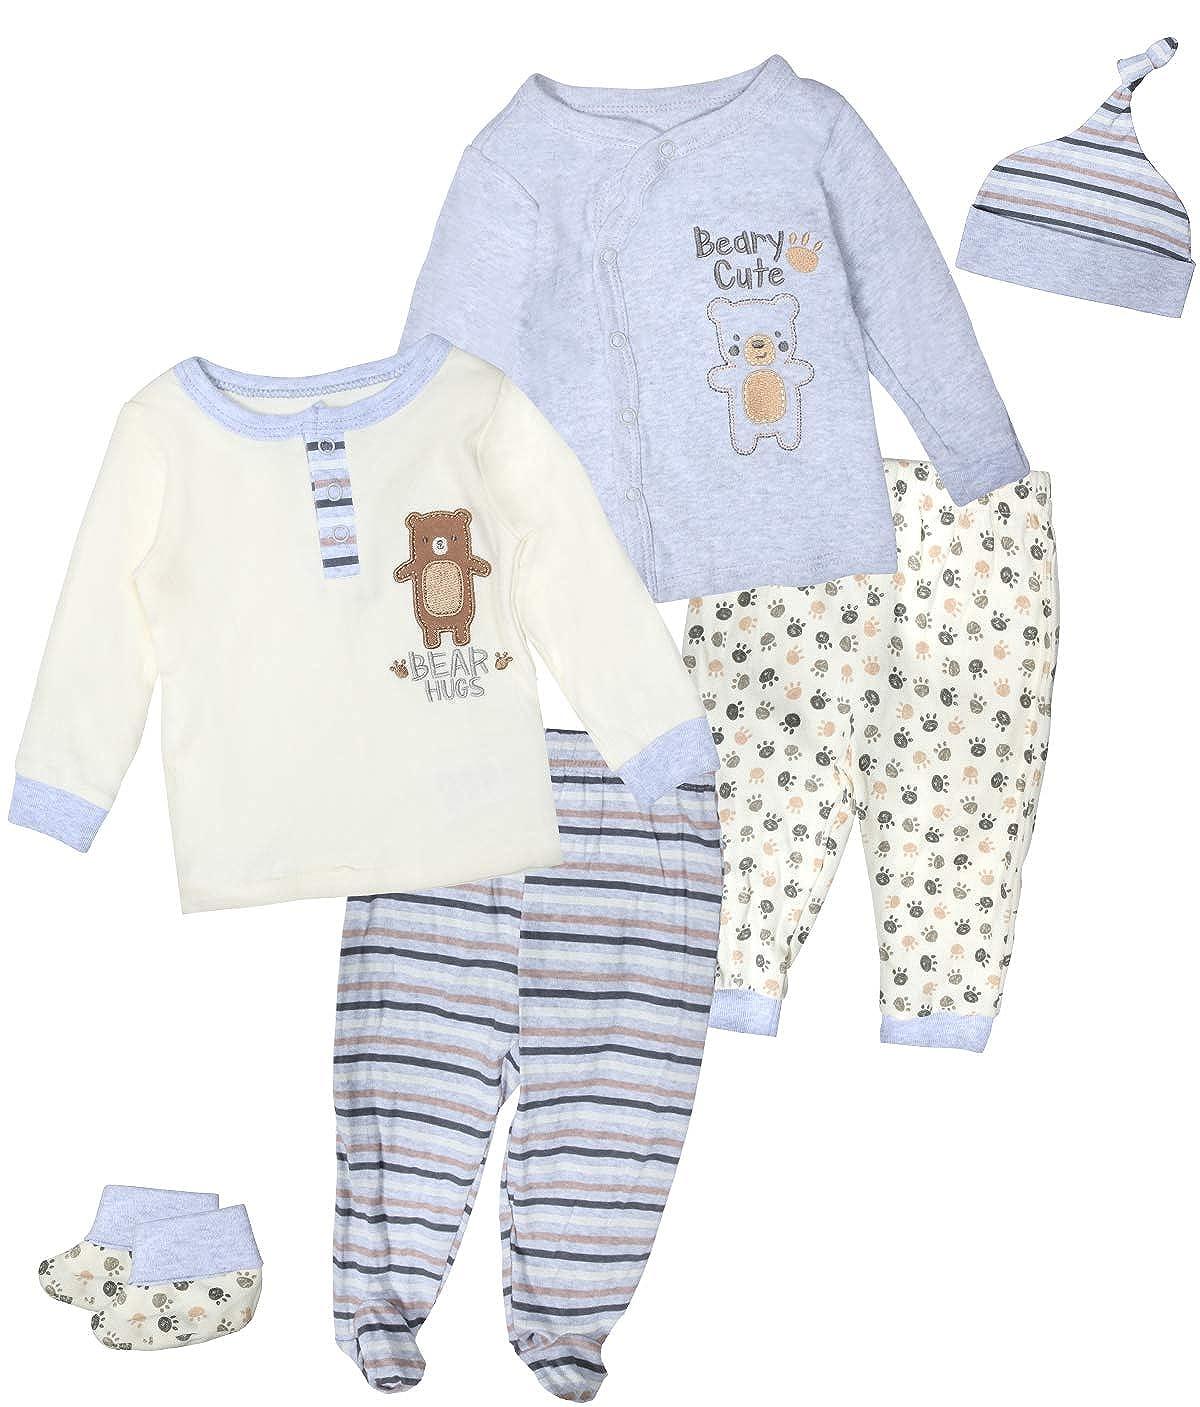 2pcs Kids Baby Boys Bear ducks T Shirt Top+Pants Toddler Infant Clothes Sets